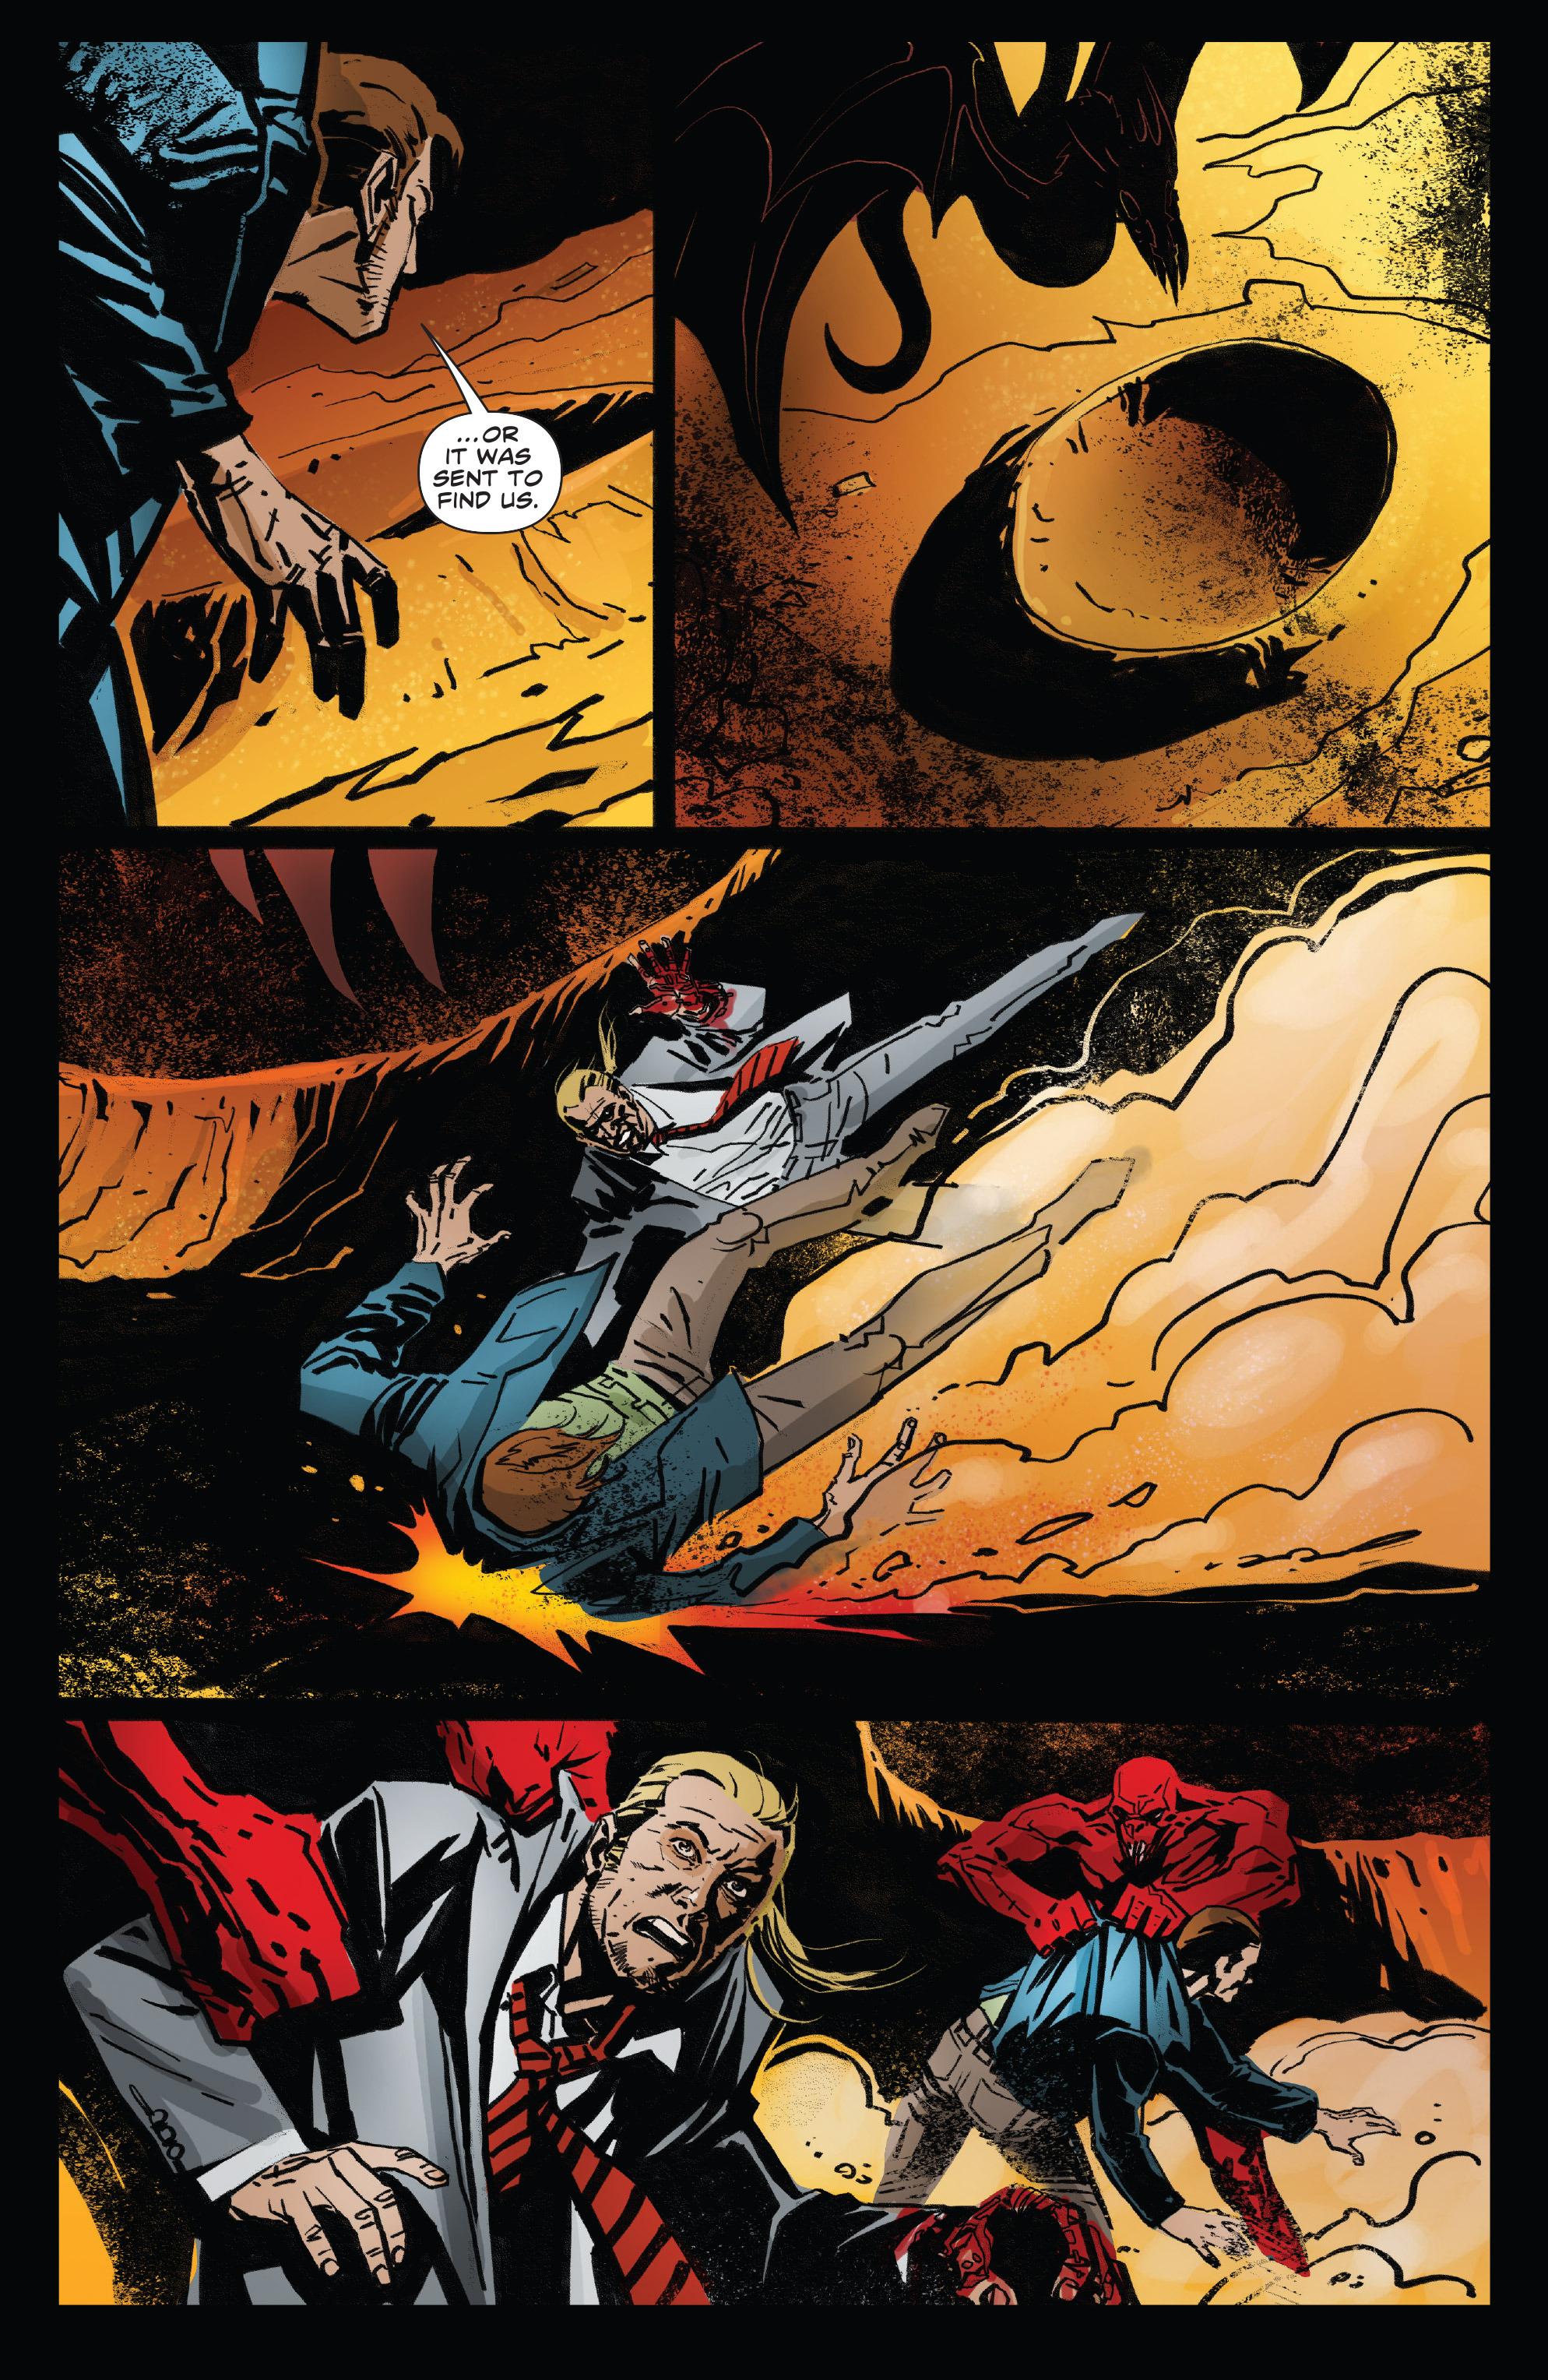 Read online Clive Barker's Hellraiser: The Dark Watch comic -  Issue # TPB 3 - 27